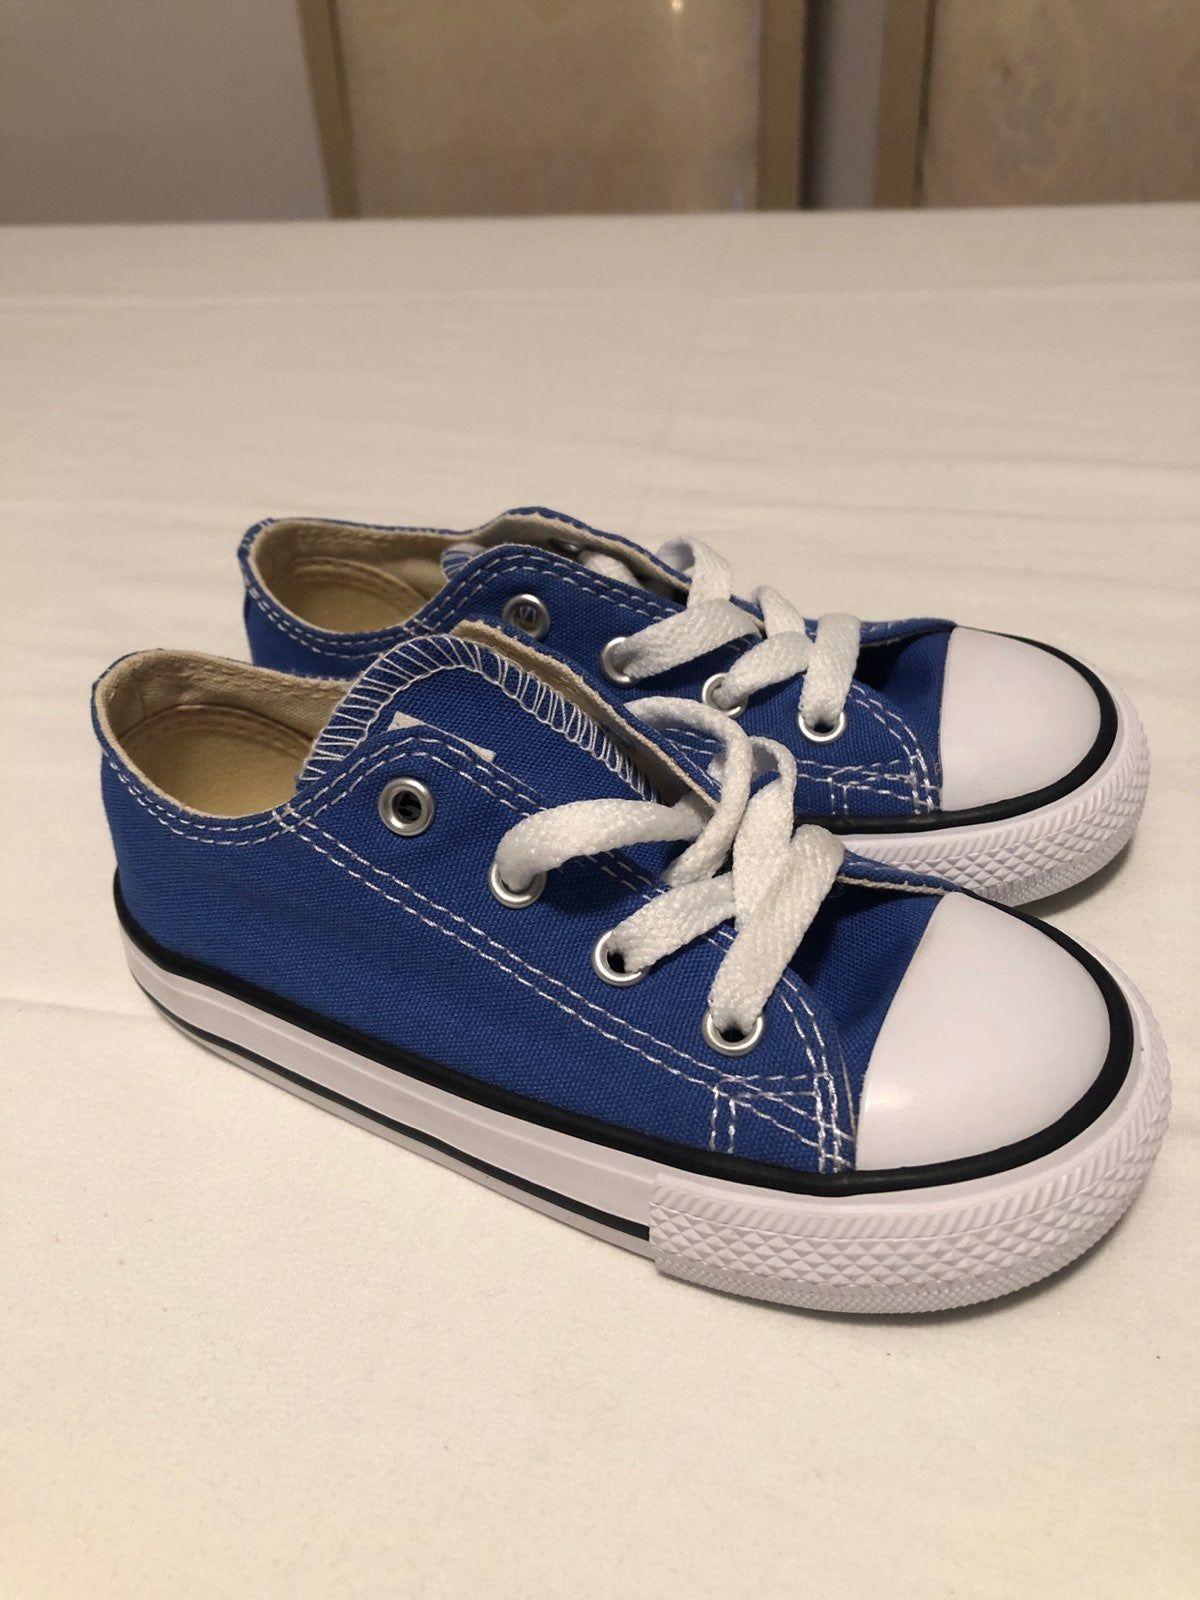 Converse shoes, Toddler shoes, Converse